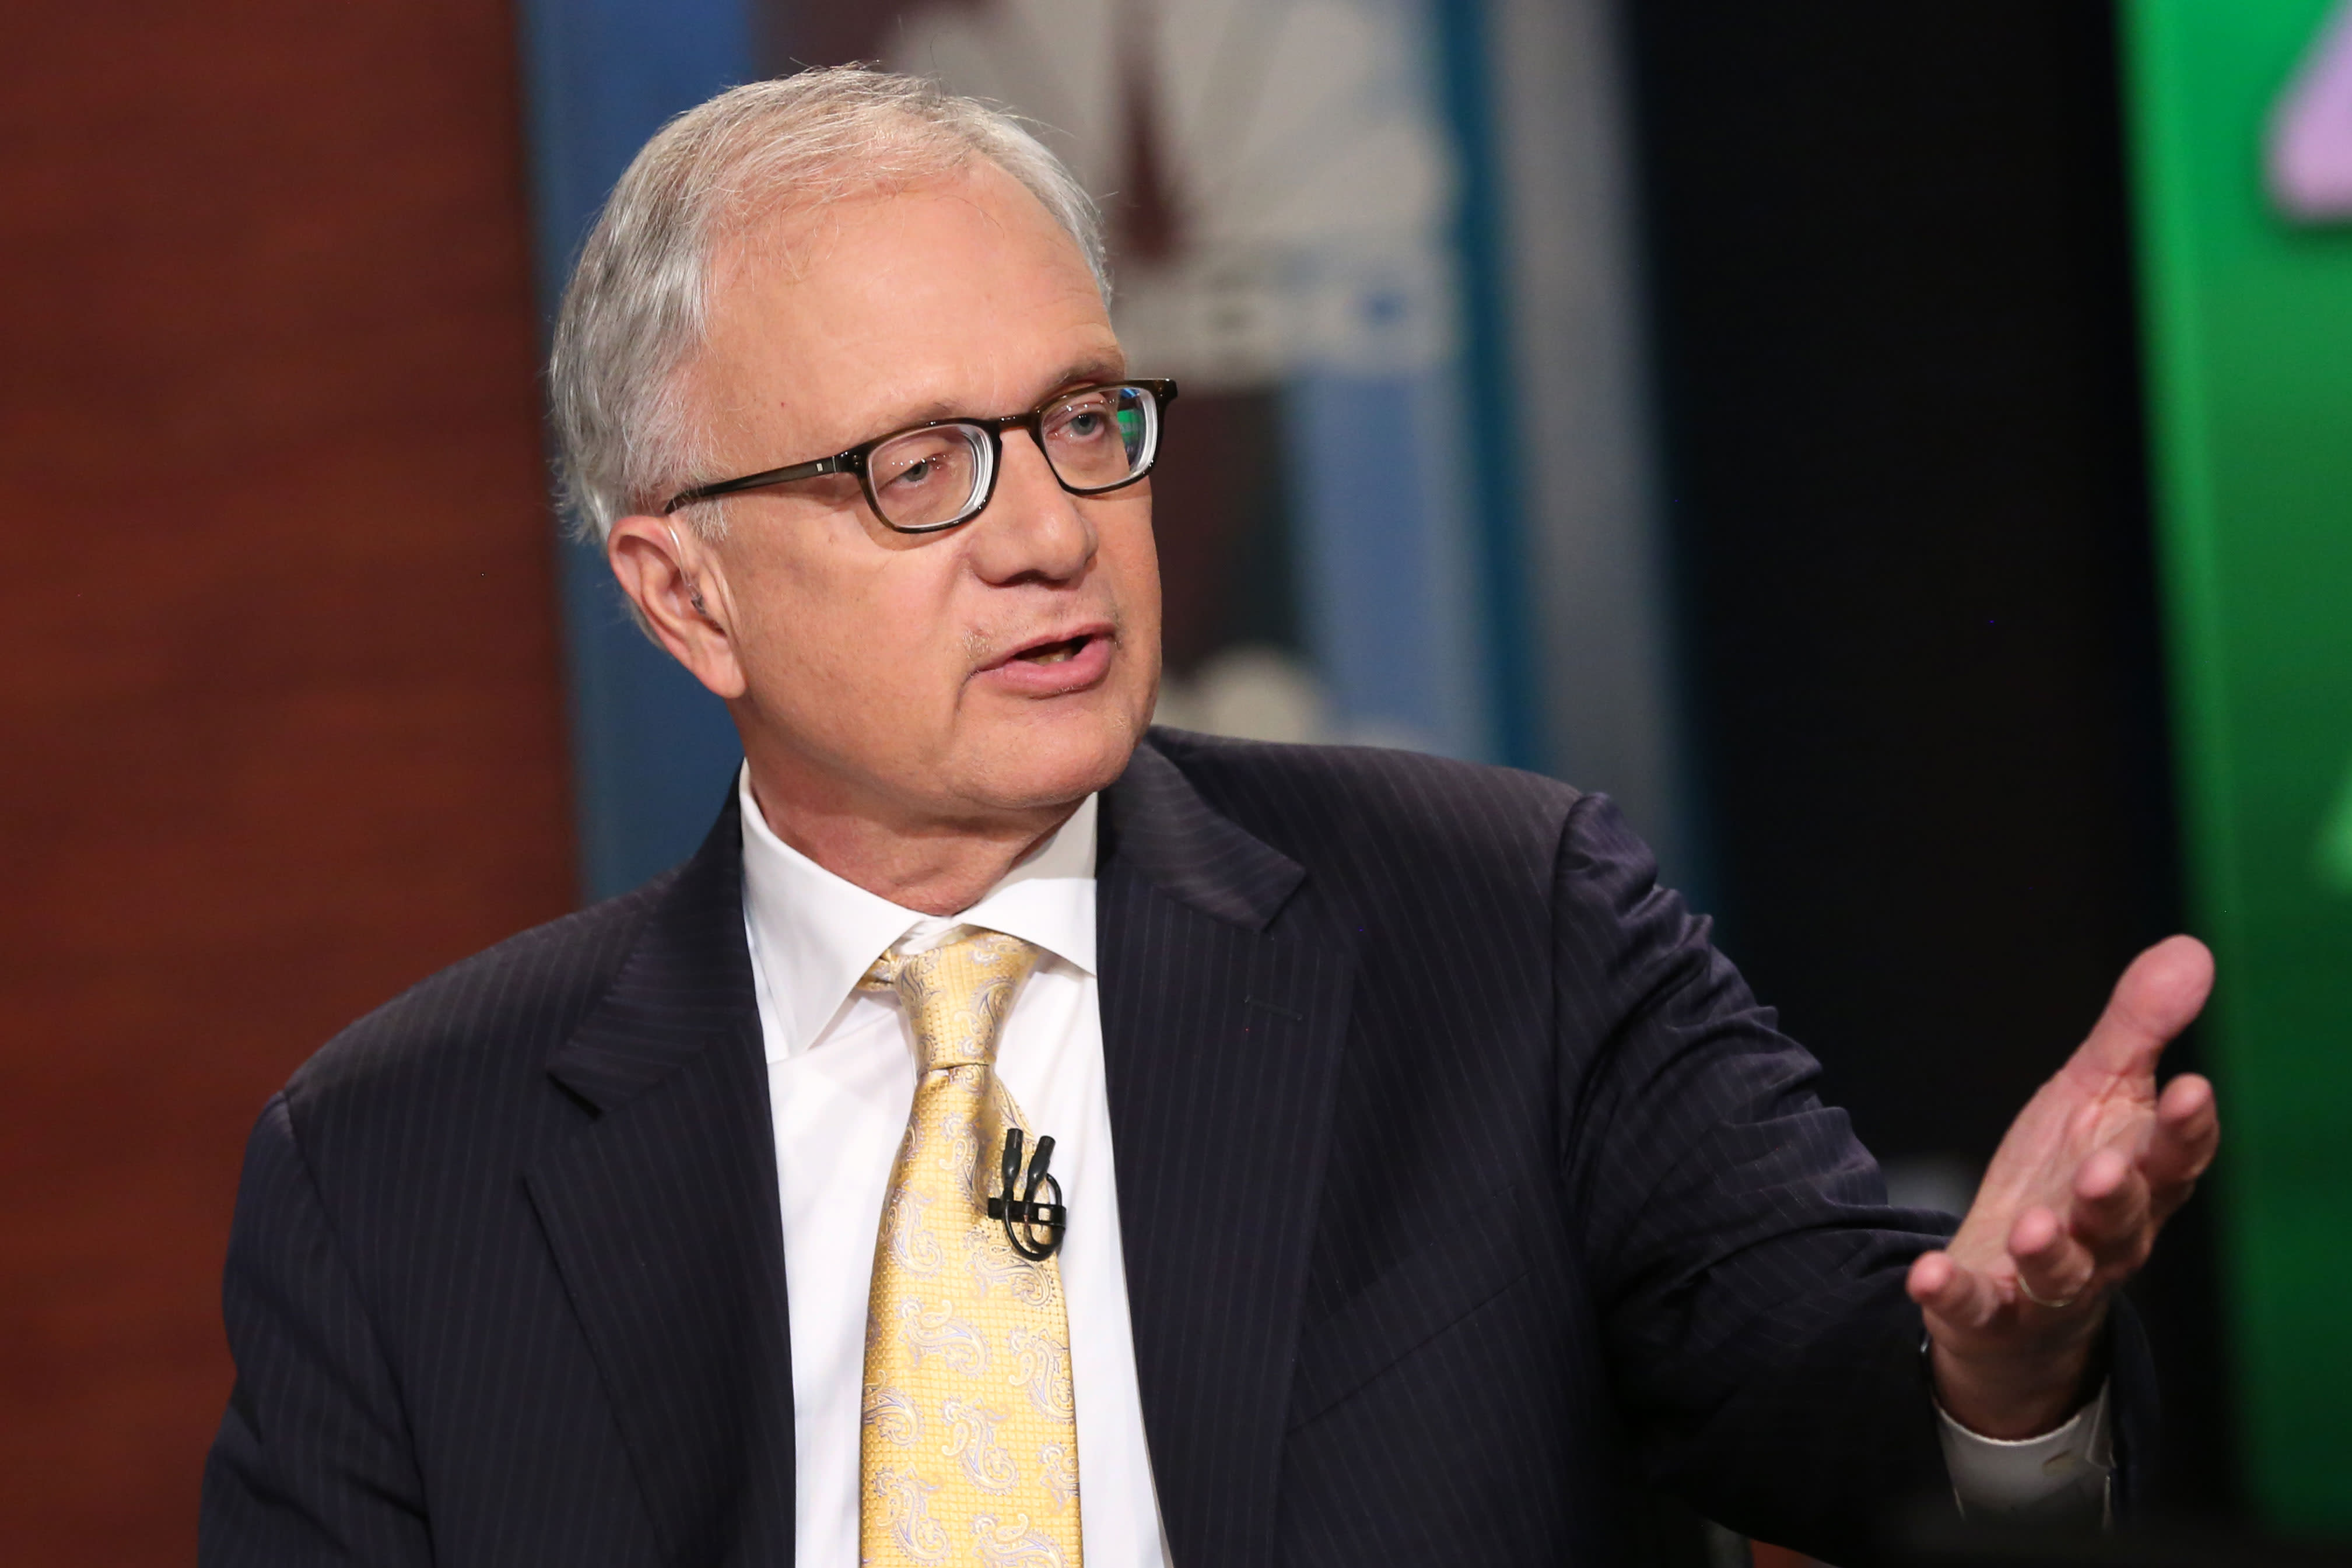 Market will return to all-time highs despite trade war jitters, Wall Street bull Ed Yardeni predicts